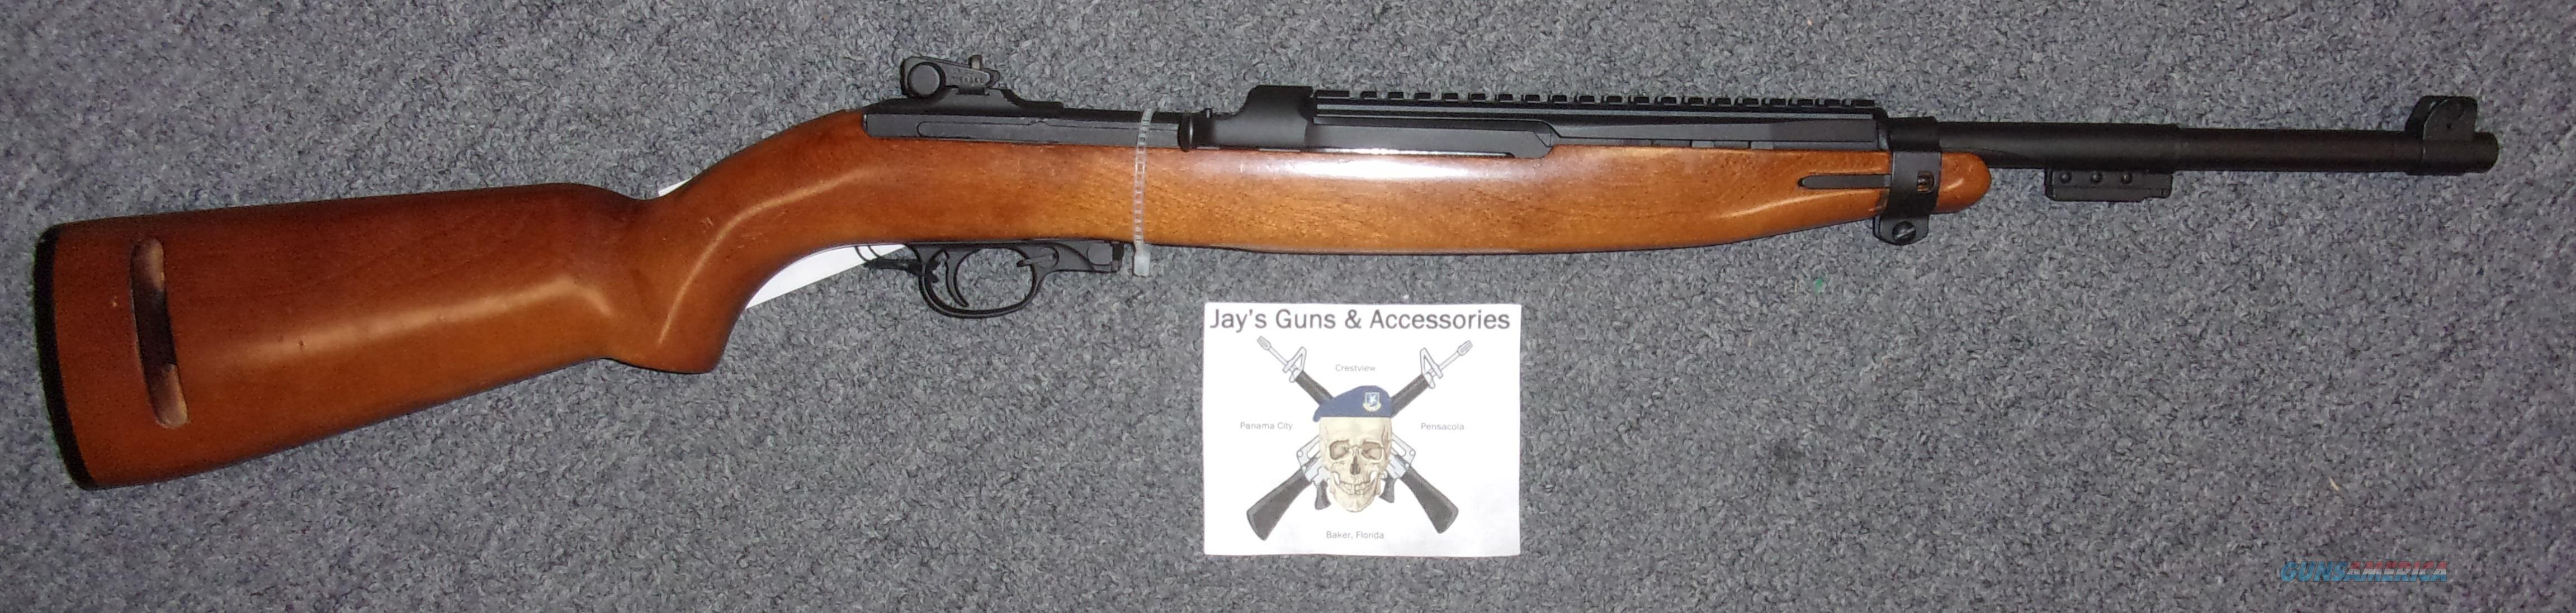 Auto Ordnance M1 Carbine  Guns > Rifles > Auto Ordnance Rifles